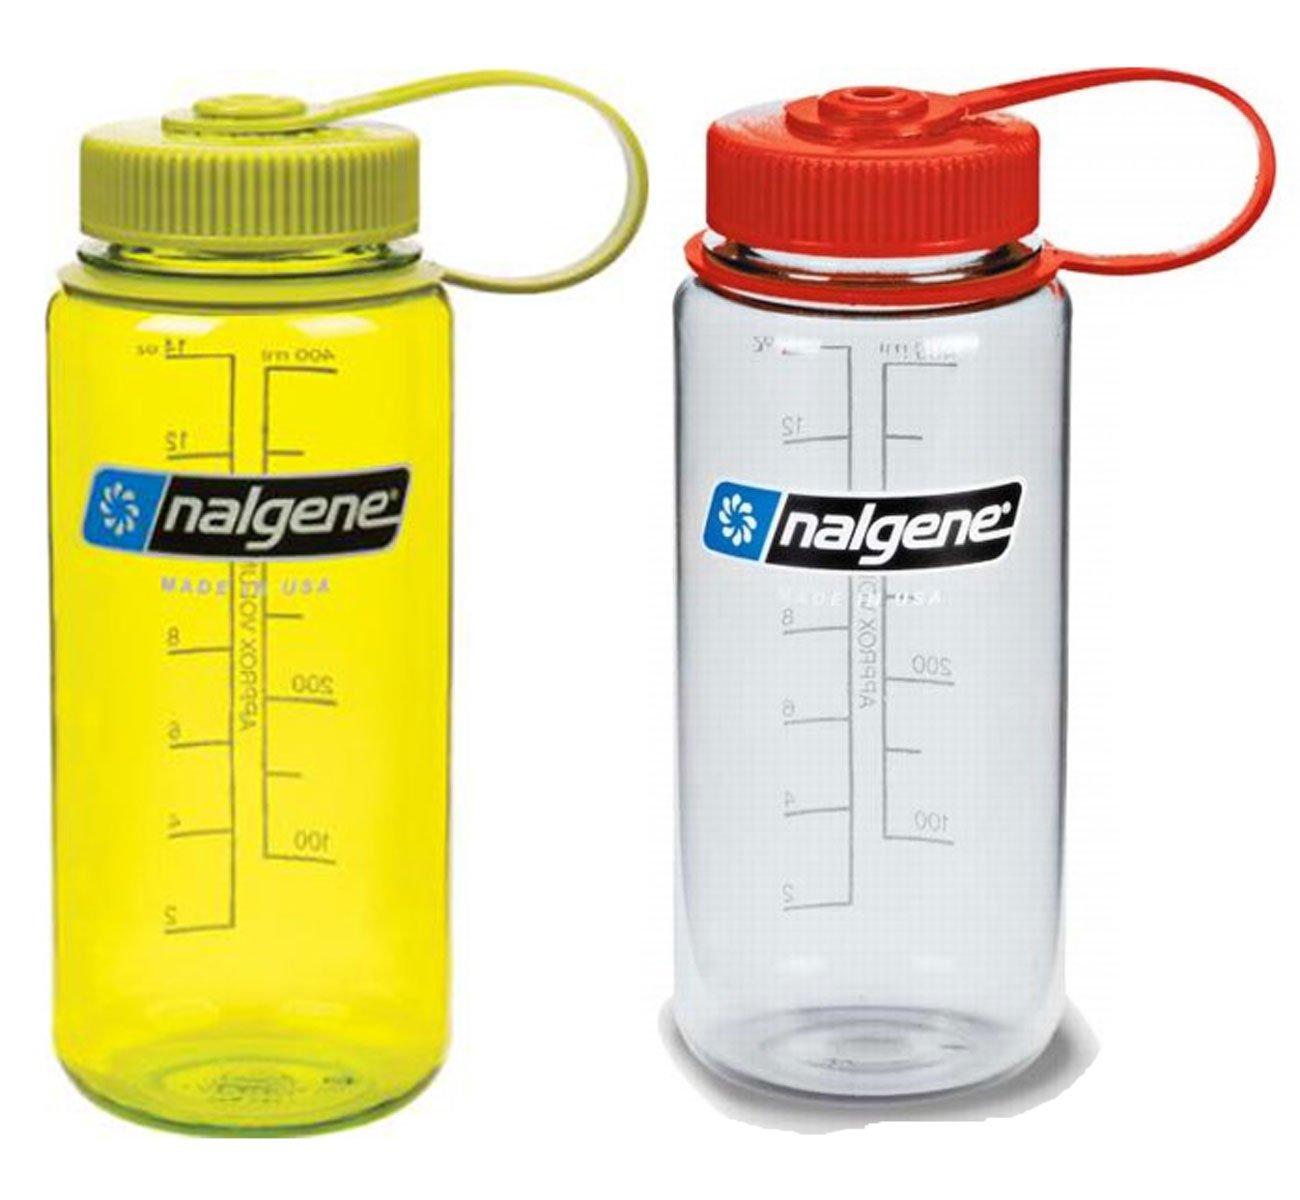 Nalgene Unisex 16oz Wide Mouth Bottle Red Sports Outdoors Lightweight